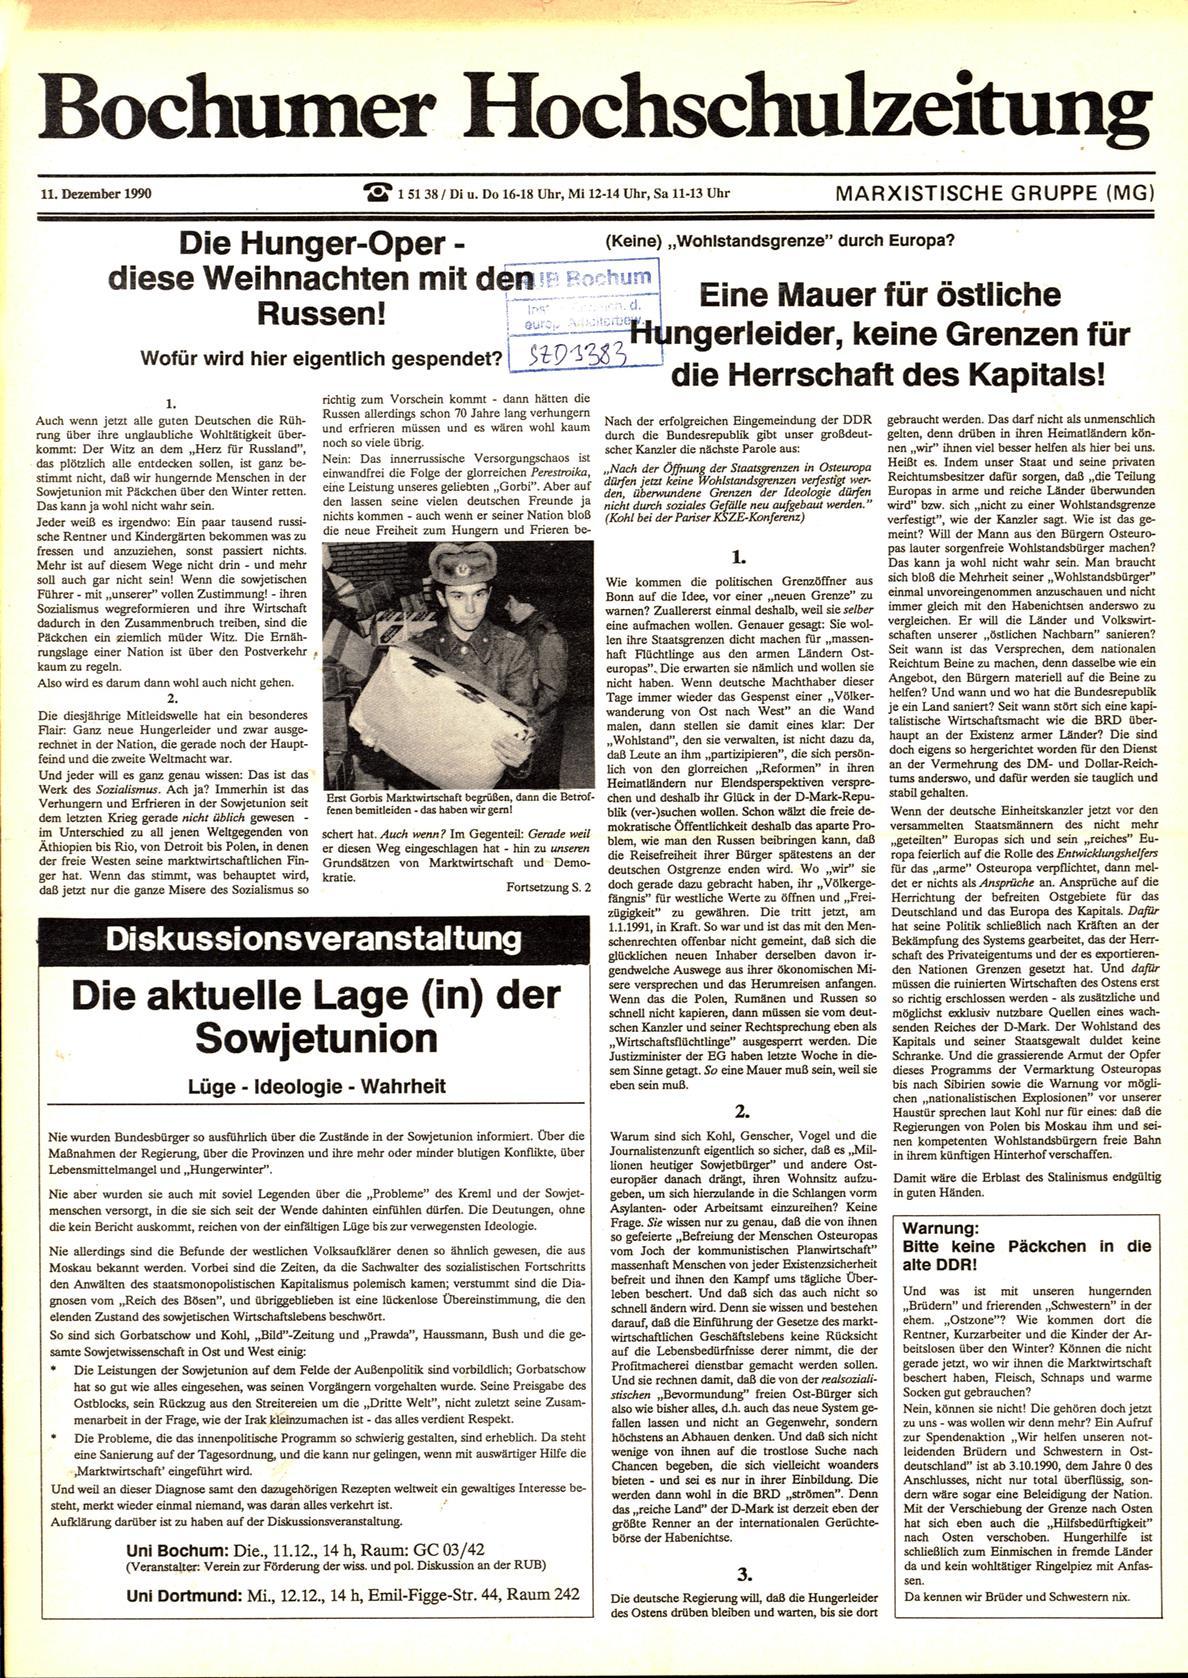 Bochum_BHZ_19901211_001